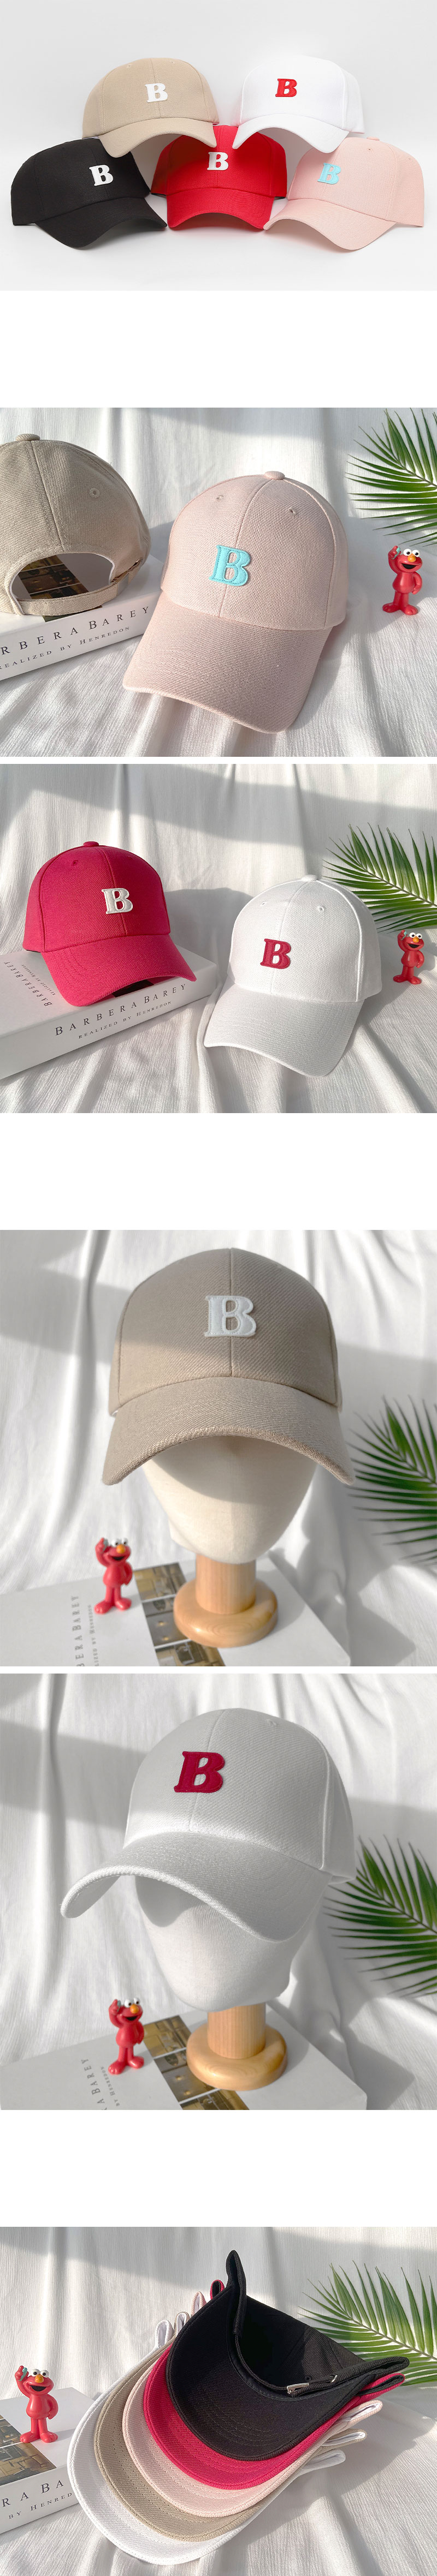 Simple B Baseball Cap-holiholic.com